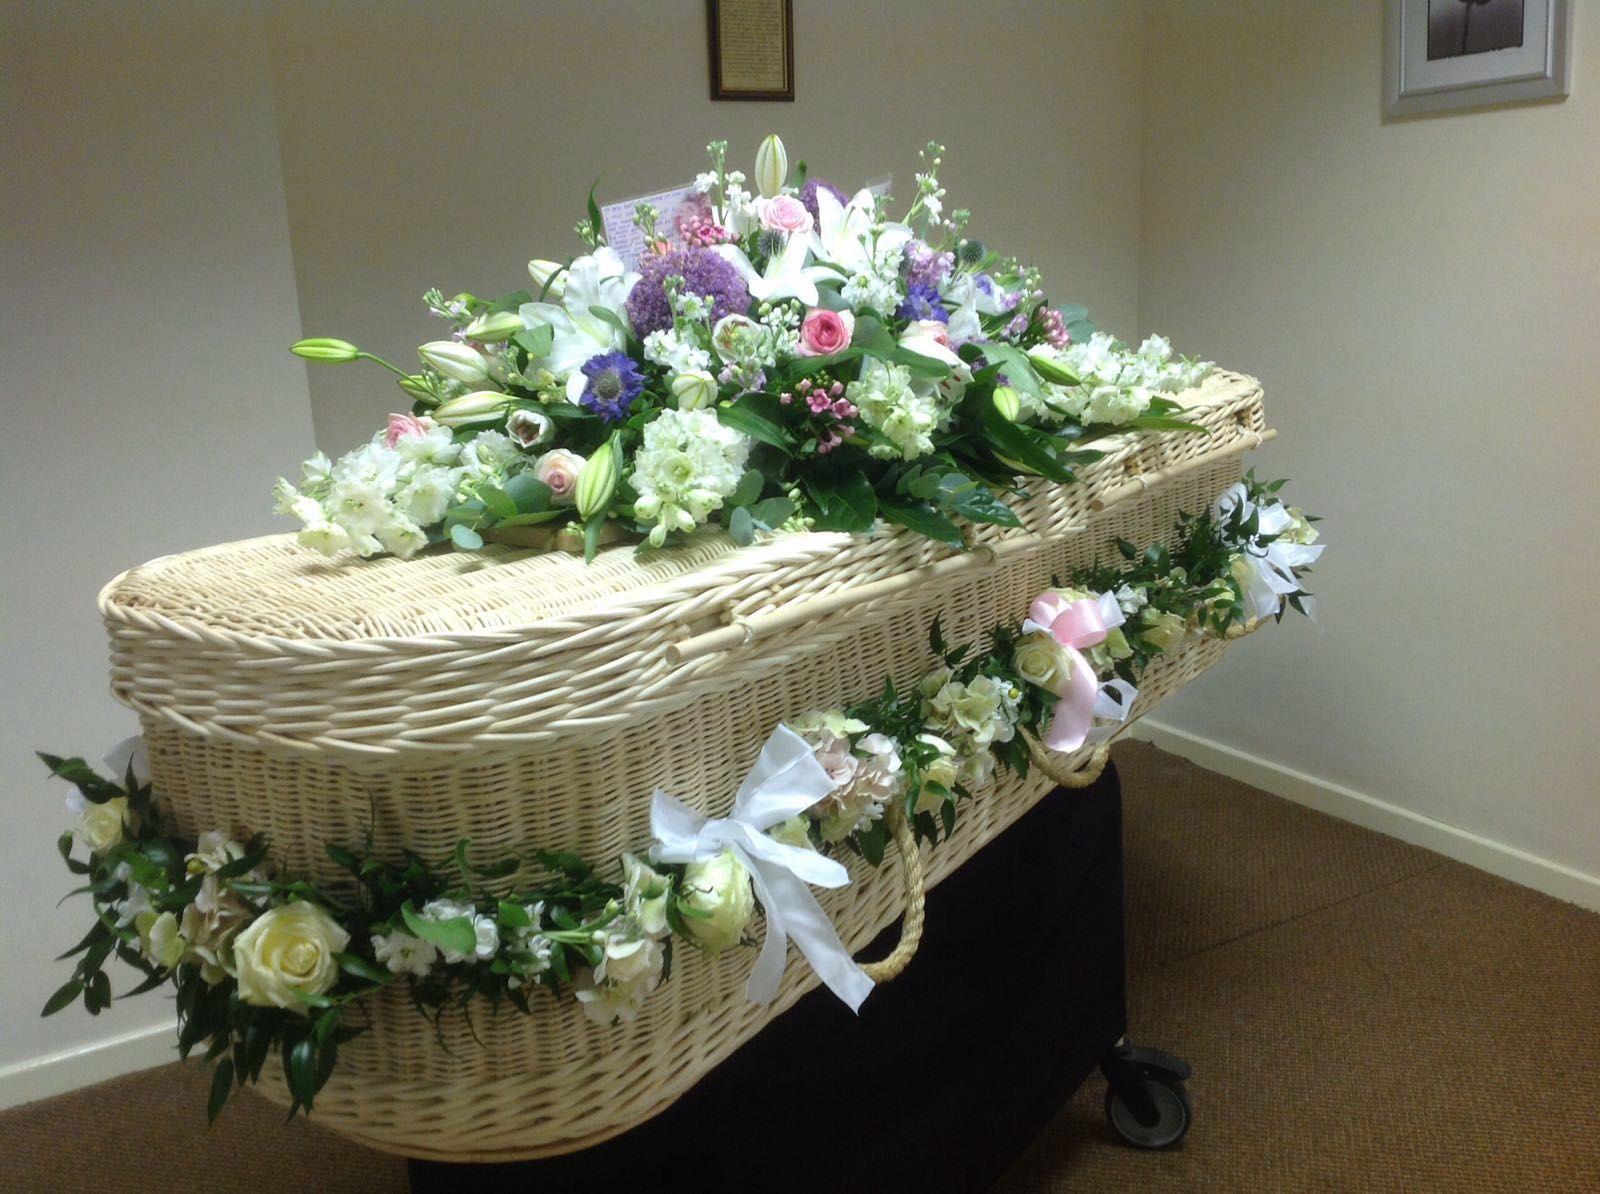 Pin Di The Manchester Florist Su Funeral Flowers Pinterest